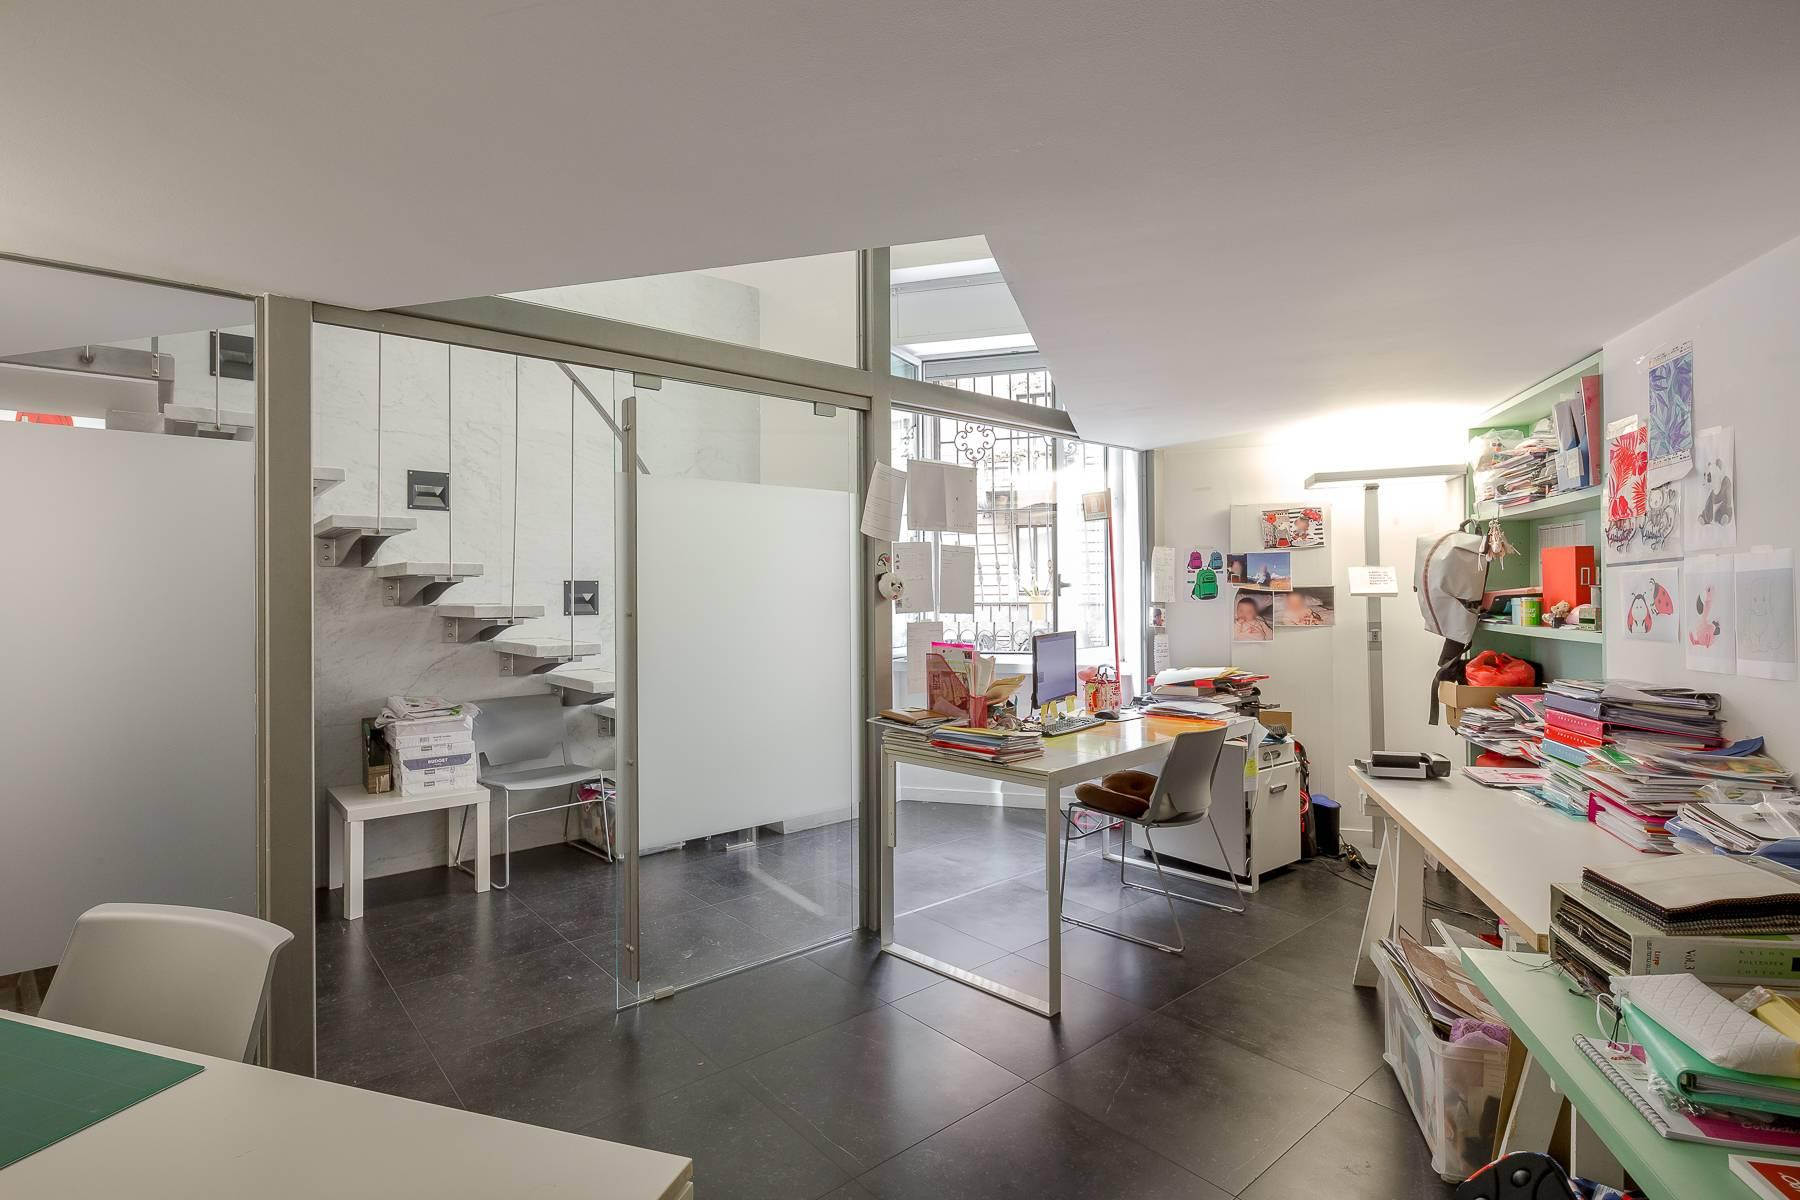 Open space office/residential property in Piazza Giovine Italia/Via Aurelio Saffi - 20